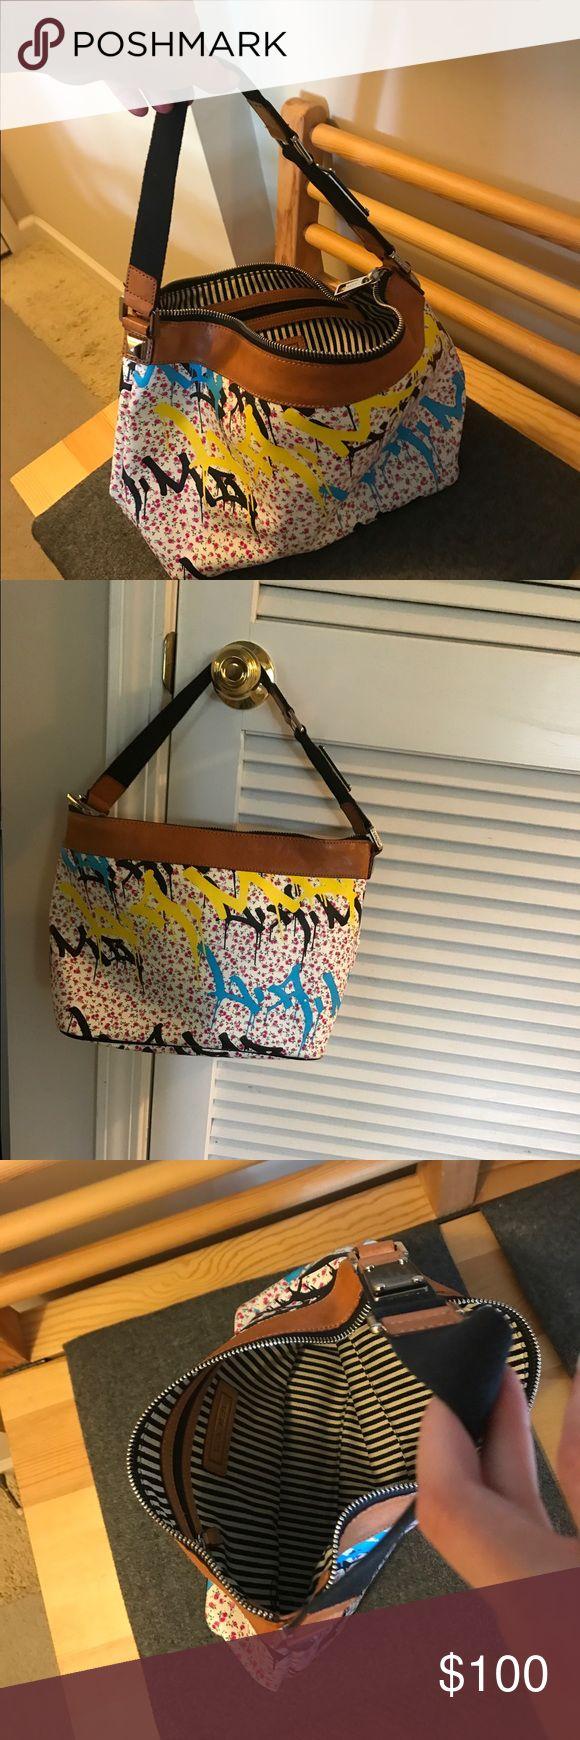 Small Lamb purse , I have 2 sizes for sale Cute Lamb purse lamb Bags Shoulder Bags